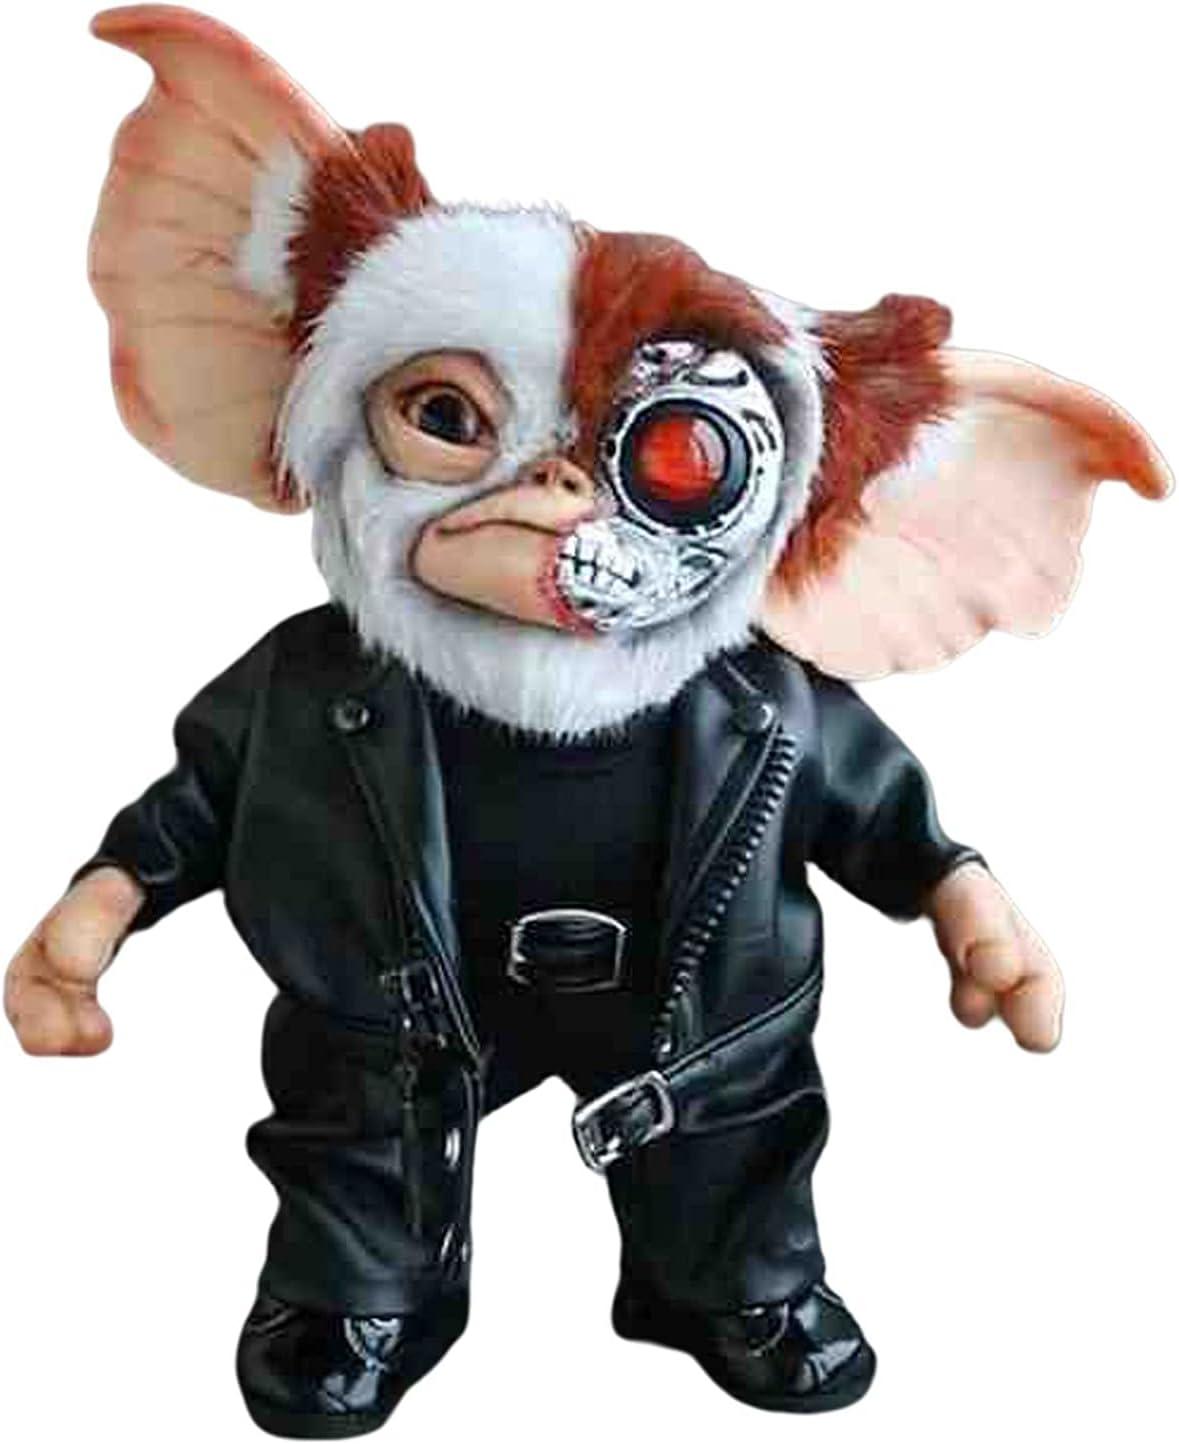 HOUHOUYIBA Muñeca Creativa Hecha a Mano, Monstruo de Peluche, Criatura artística de Gizmo de Fieltro en Miniatura, Linda muñeca Gremlins Monster Horror Mogwai (Muñeca de Cuero)